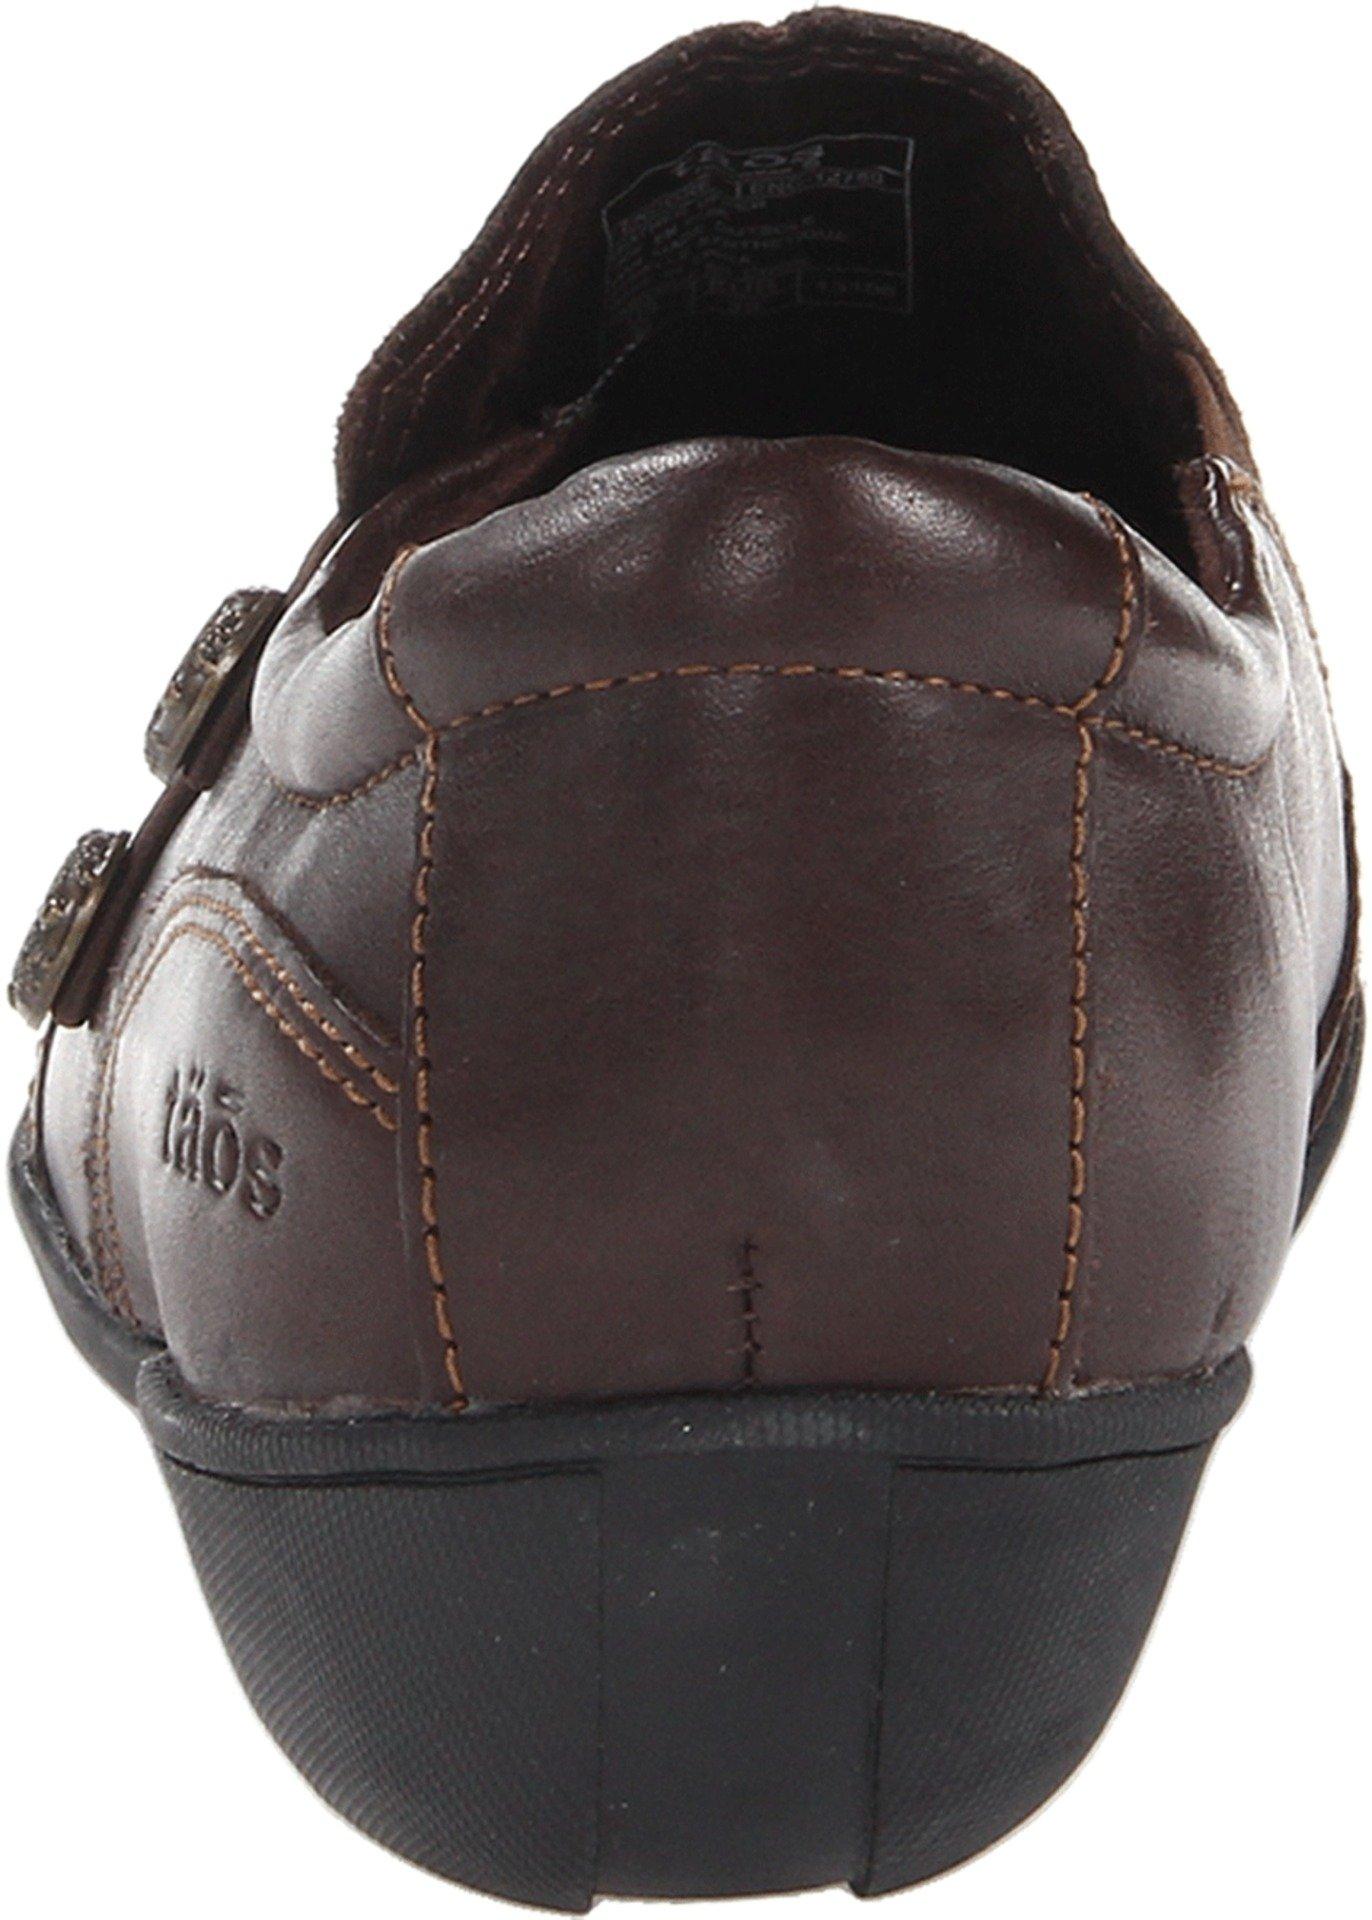 Taos Women's Encore Flat,Chocolate,7 M US by Taos Footwear (Image #2)